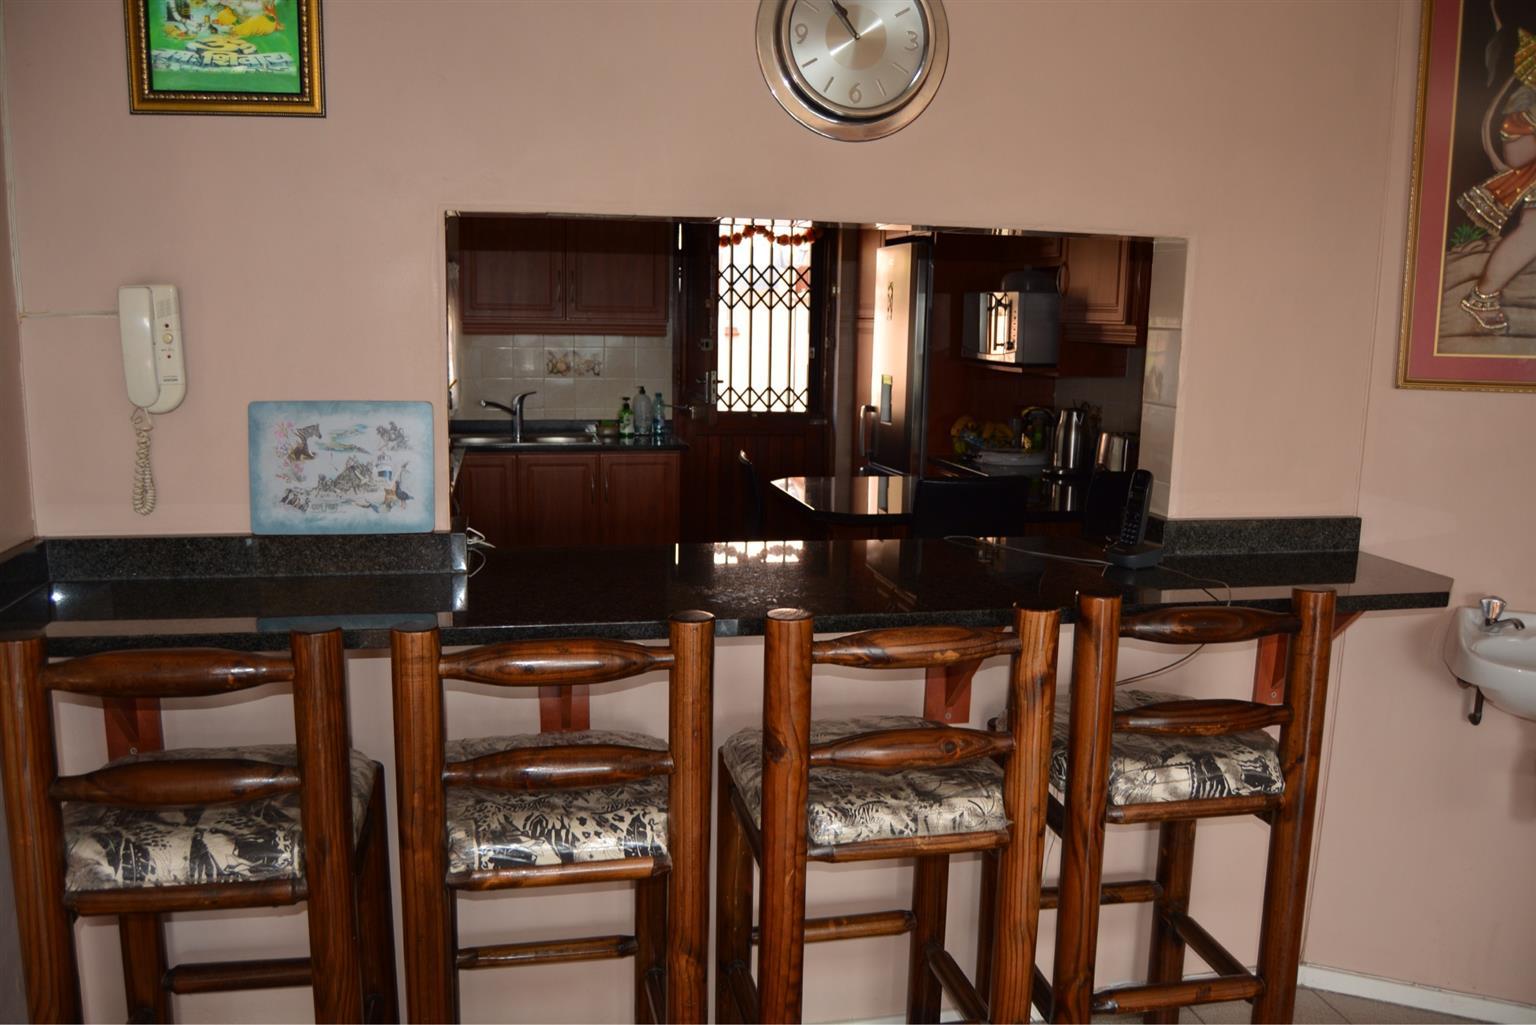 REDUCED!!! URGENT SALE - 3 BEDROOM HOME IN SHALLCROSS(SOLE MANDATE)